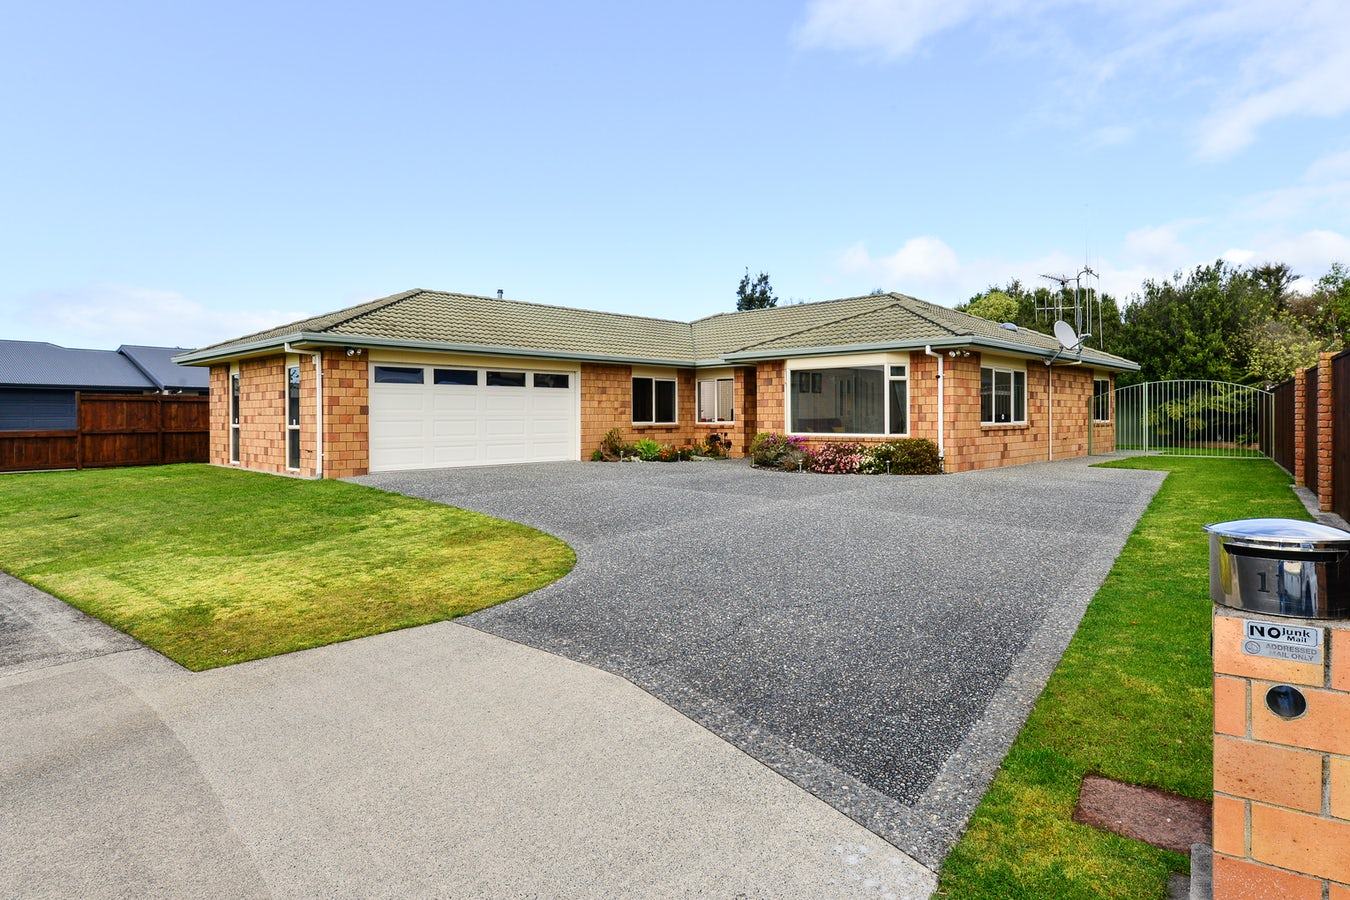 11 Logan Court Chartwell | Lugton's Real Estate - NZ